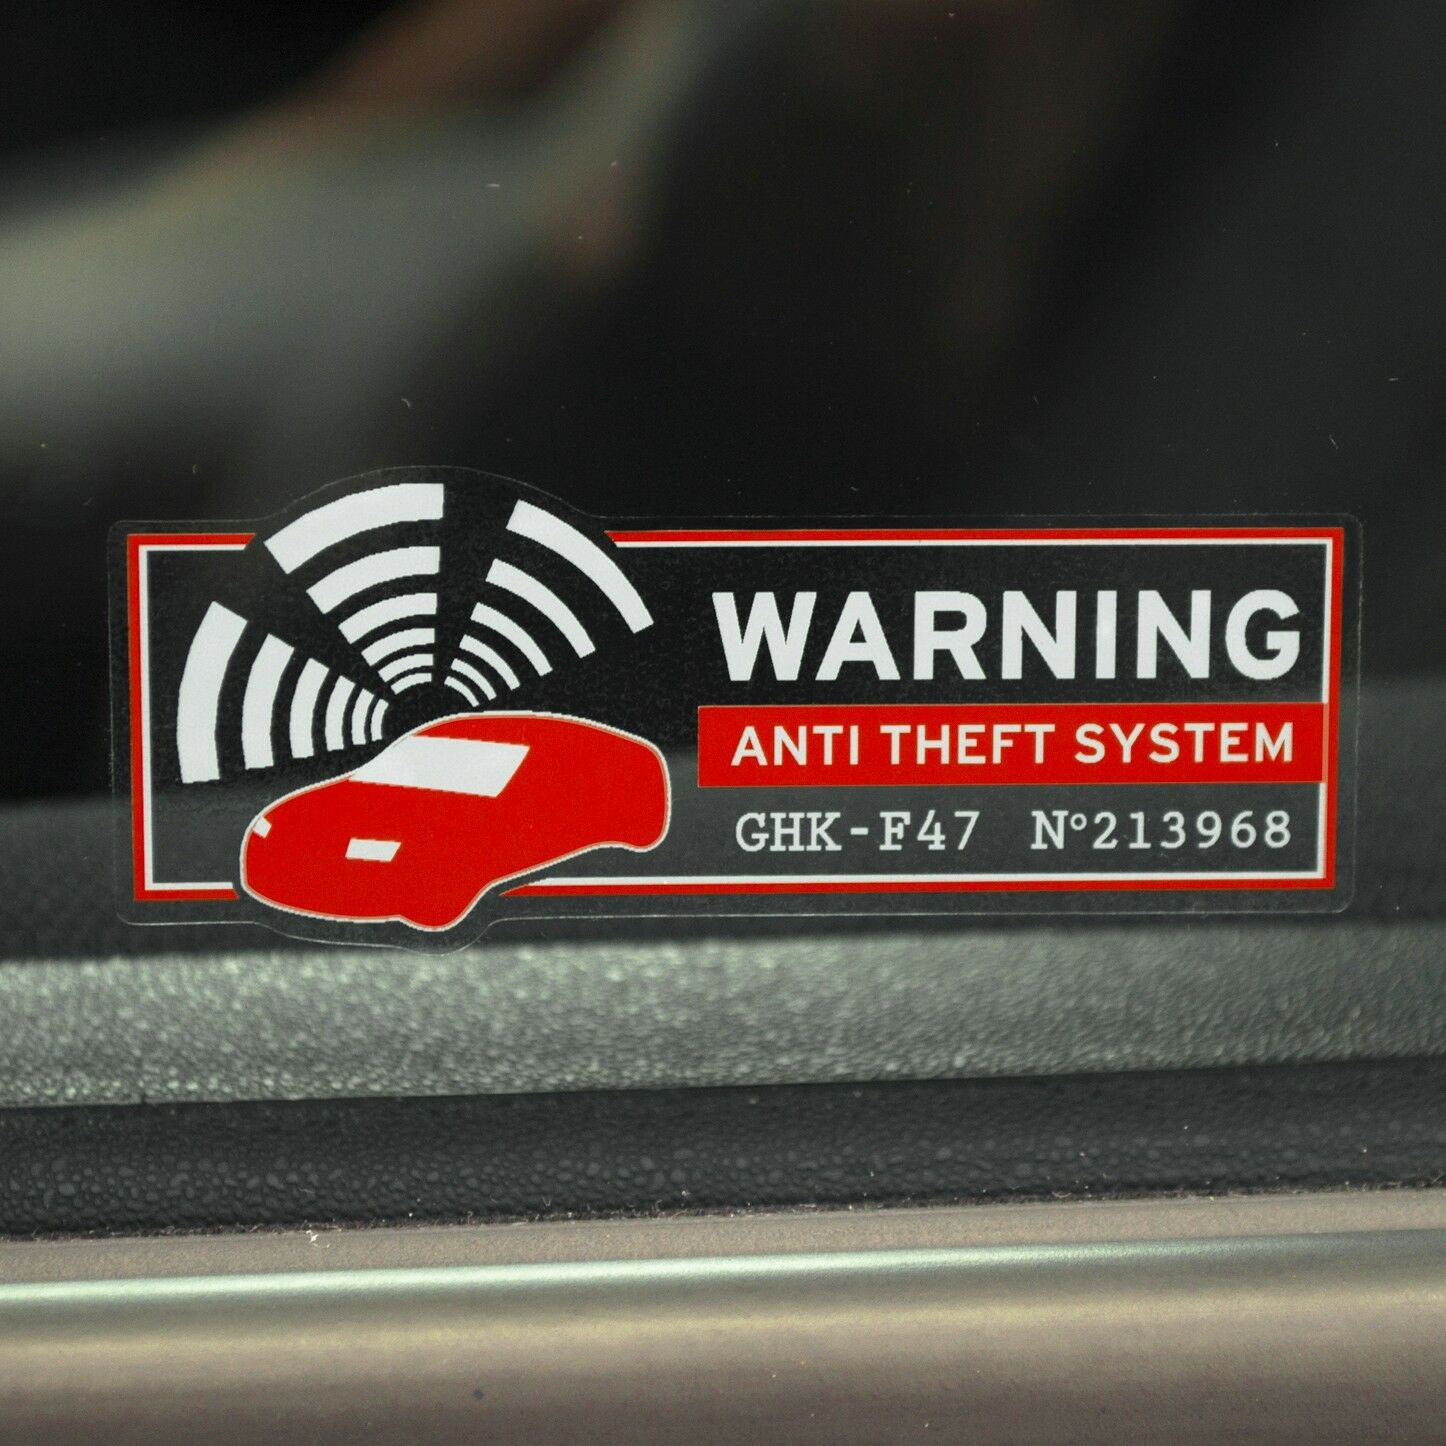 Car alarm sticker security warning car alarm sticker car alarm sticker home